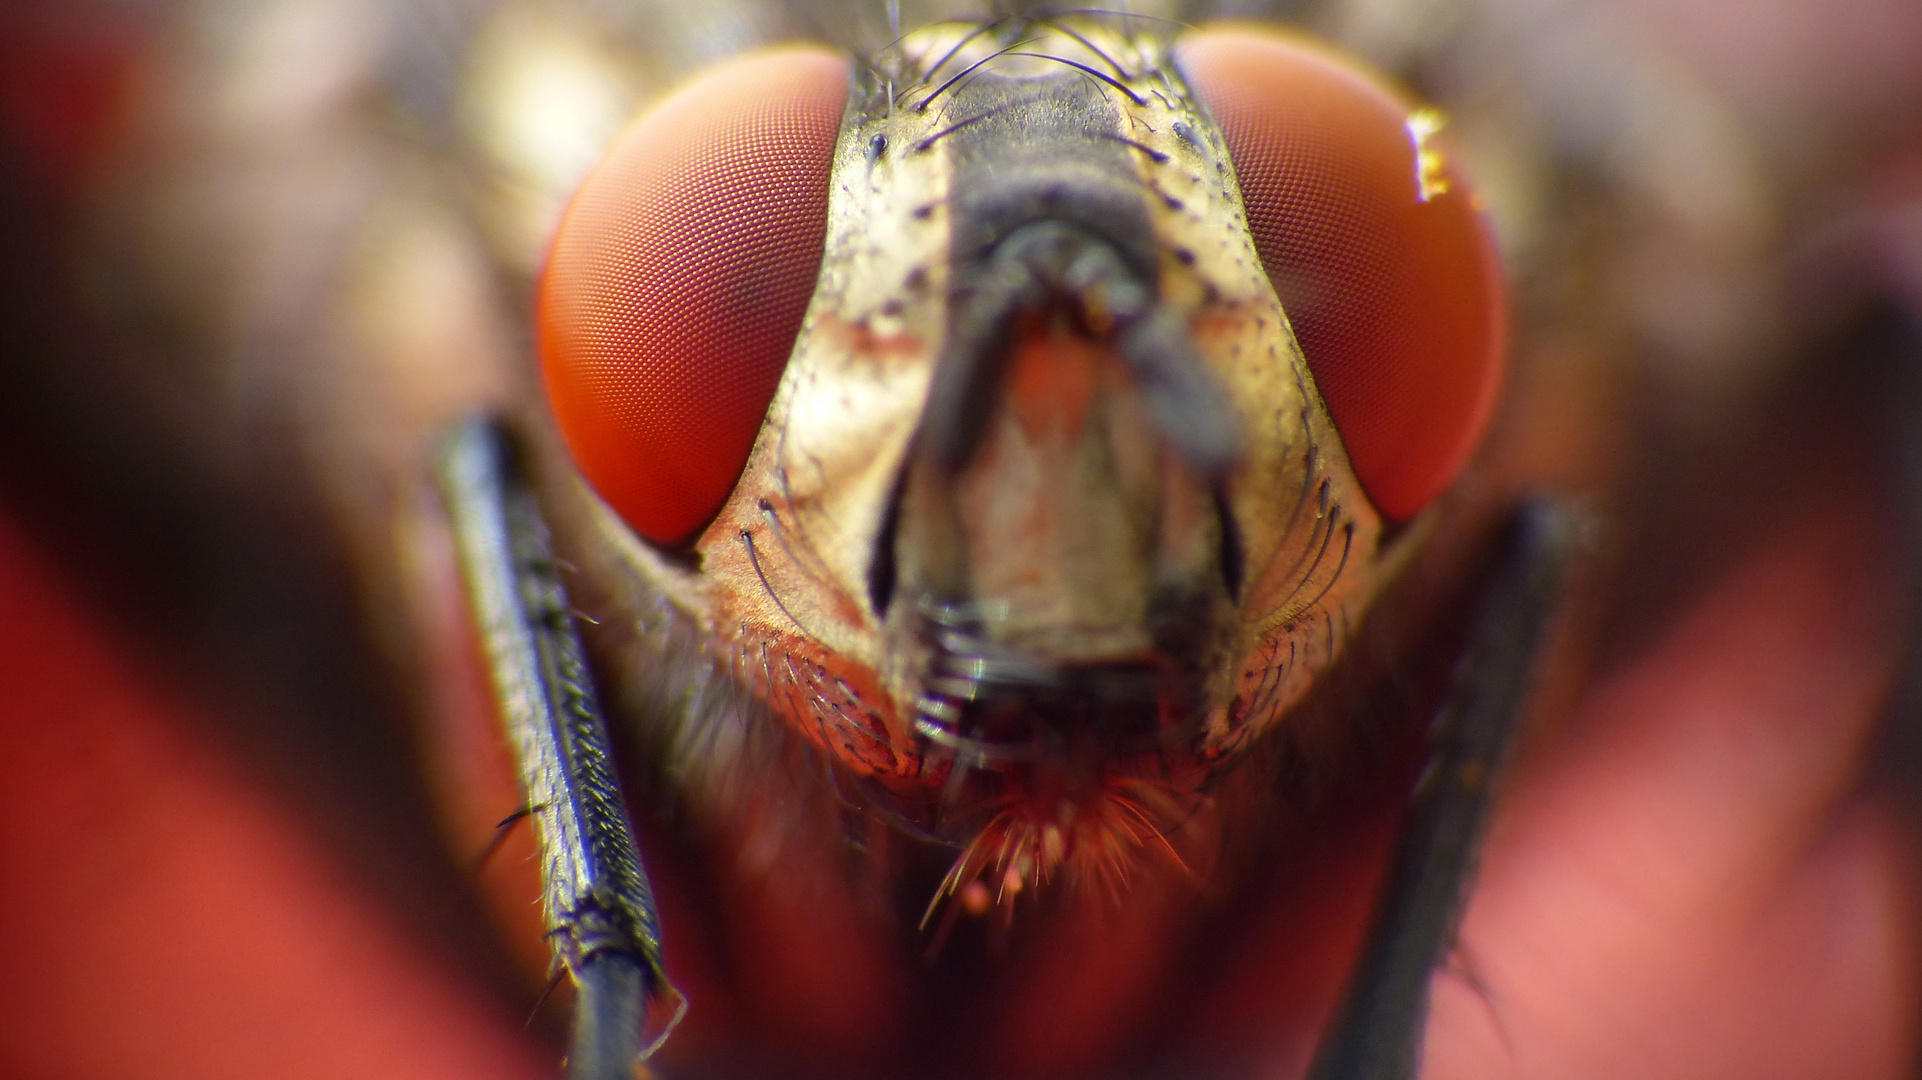 Fliege in groß